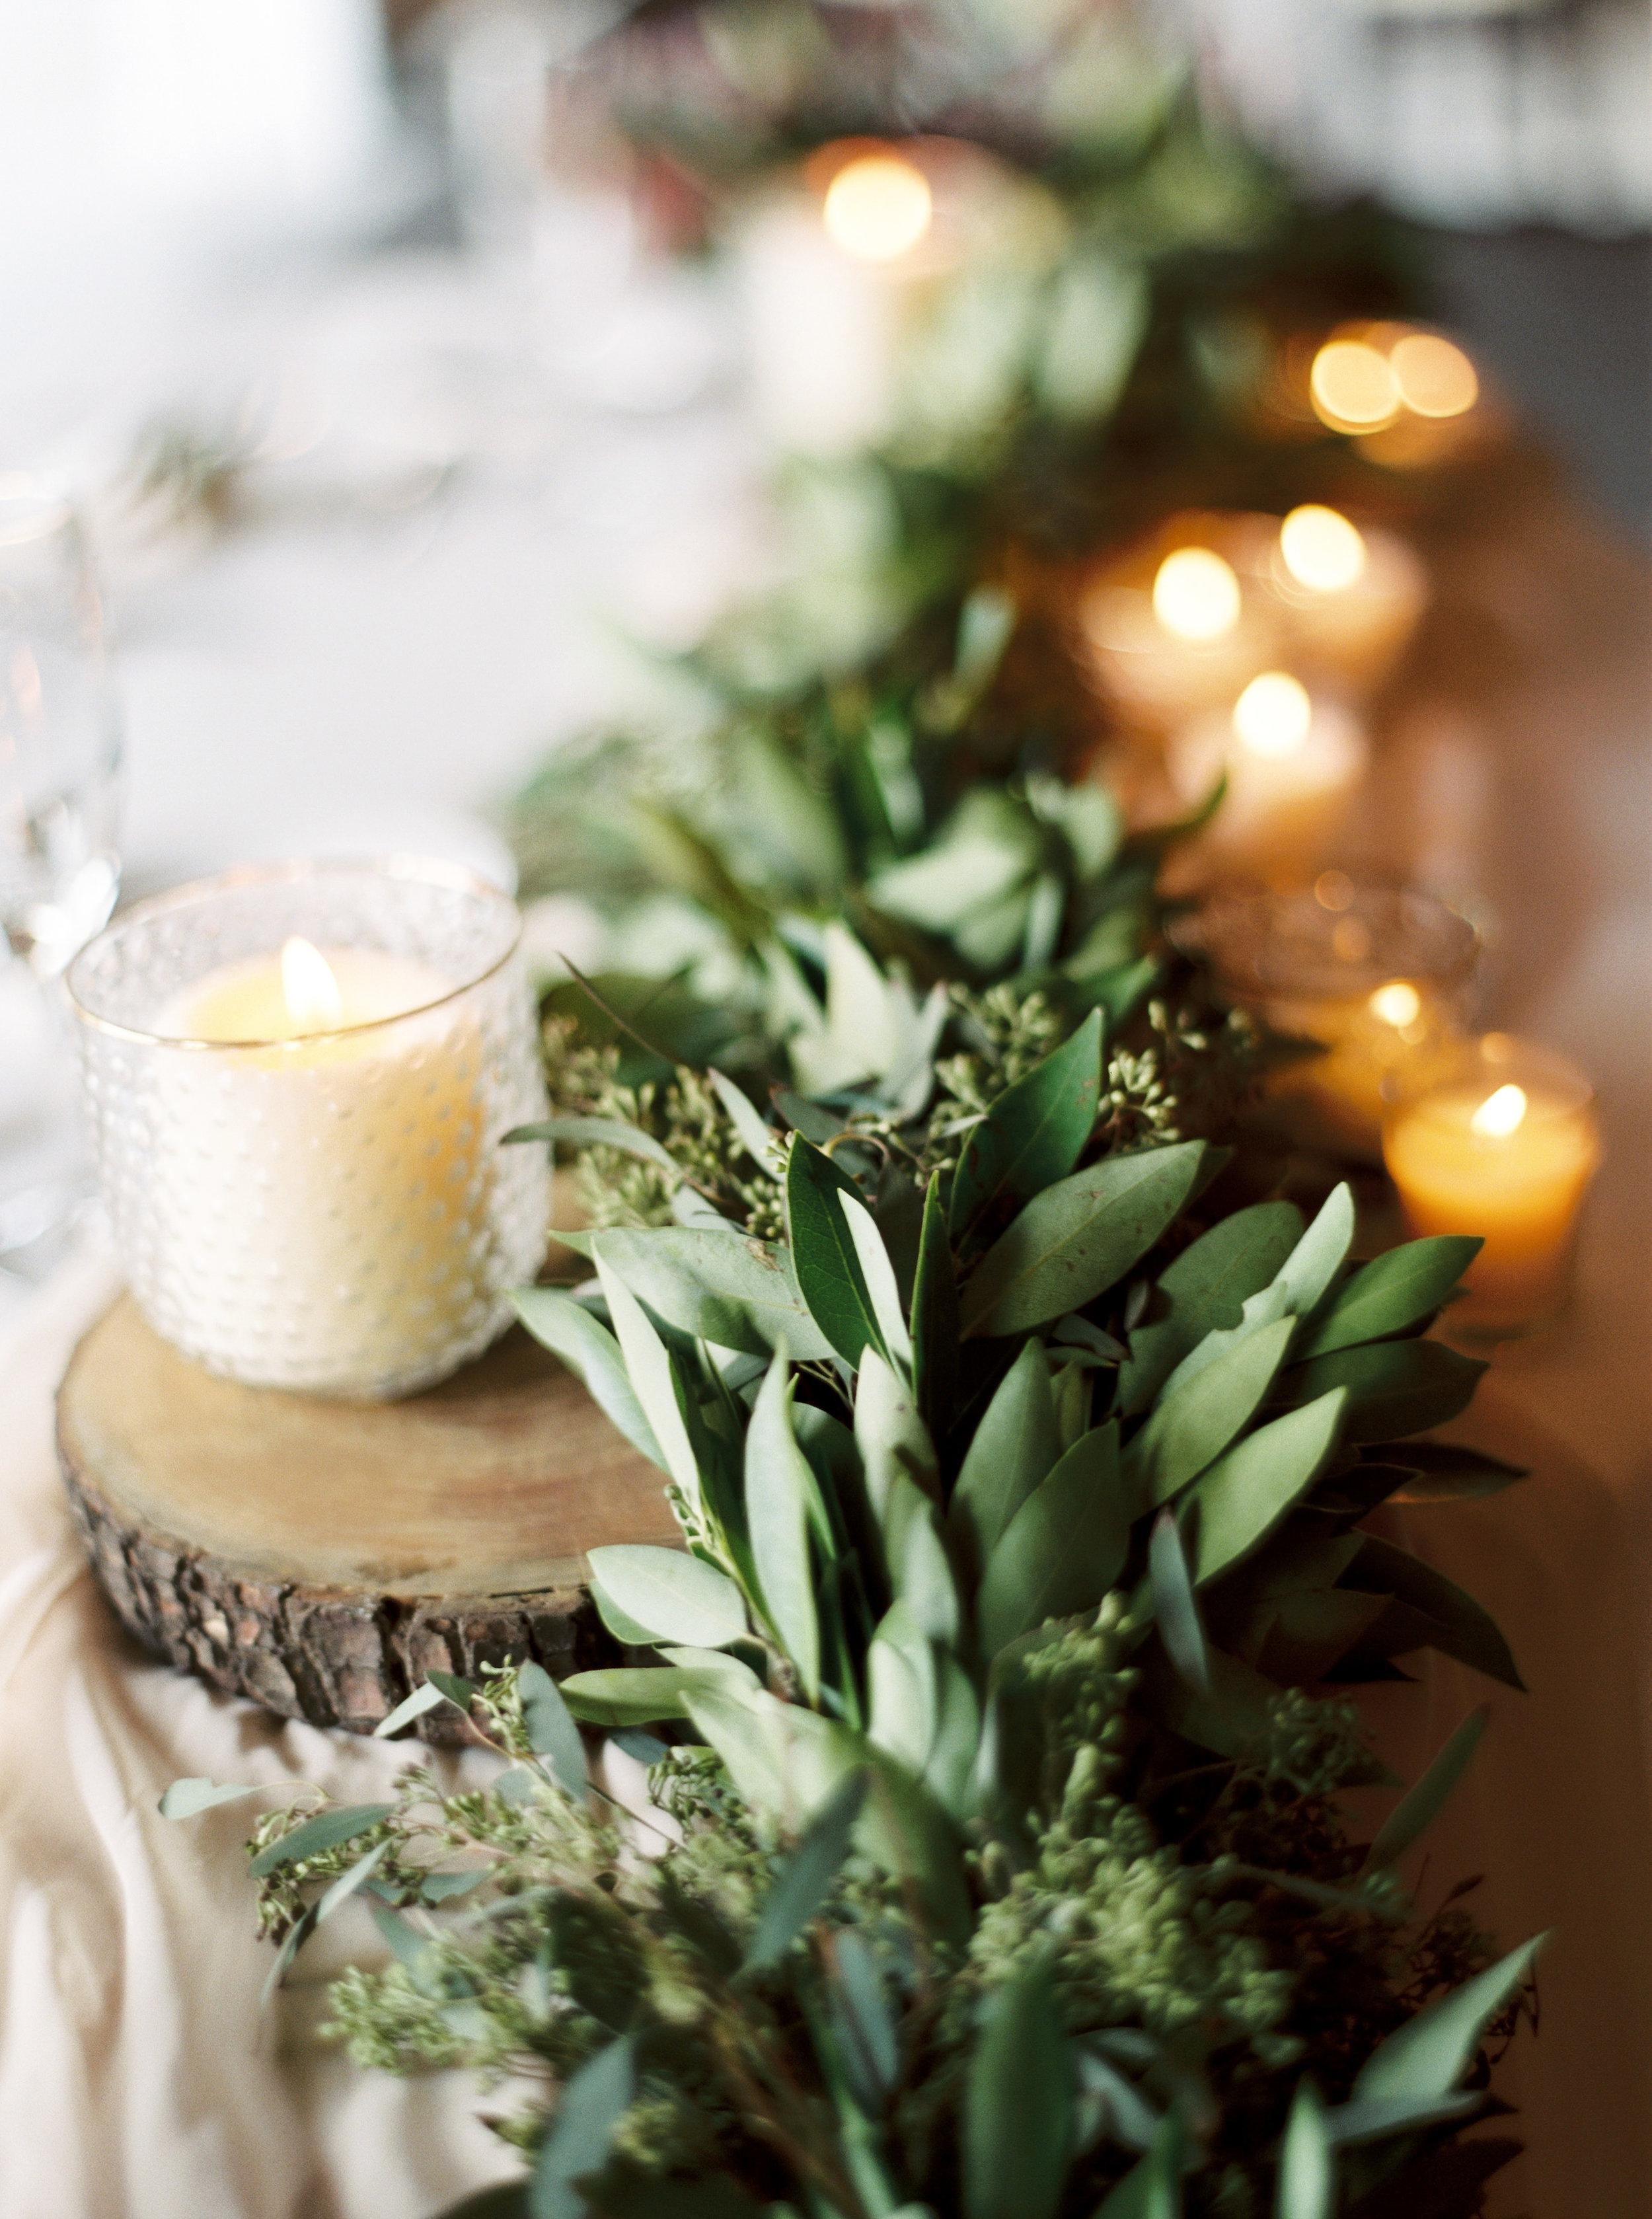 Tenaya-lodge-wedding-at-yosemite-national-park-california-23.jpg